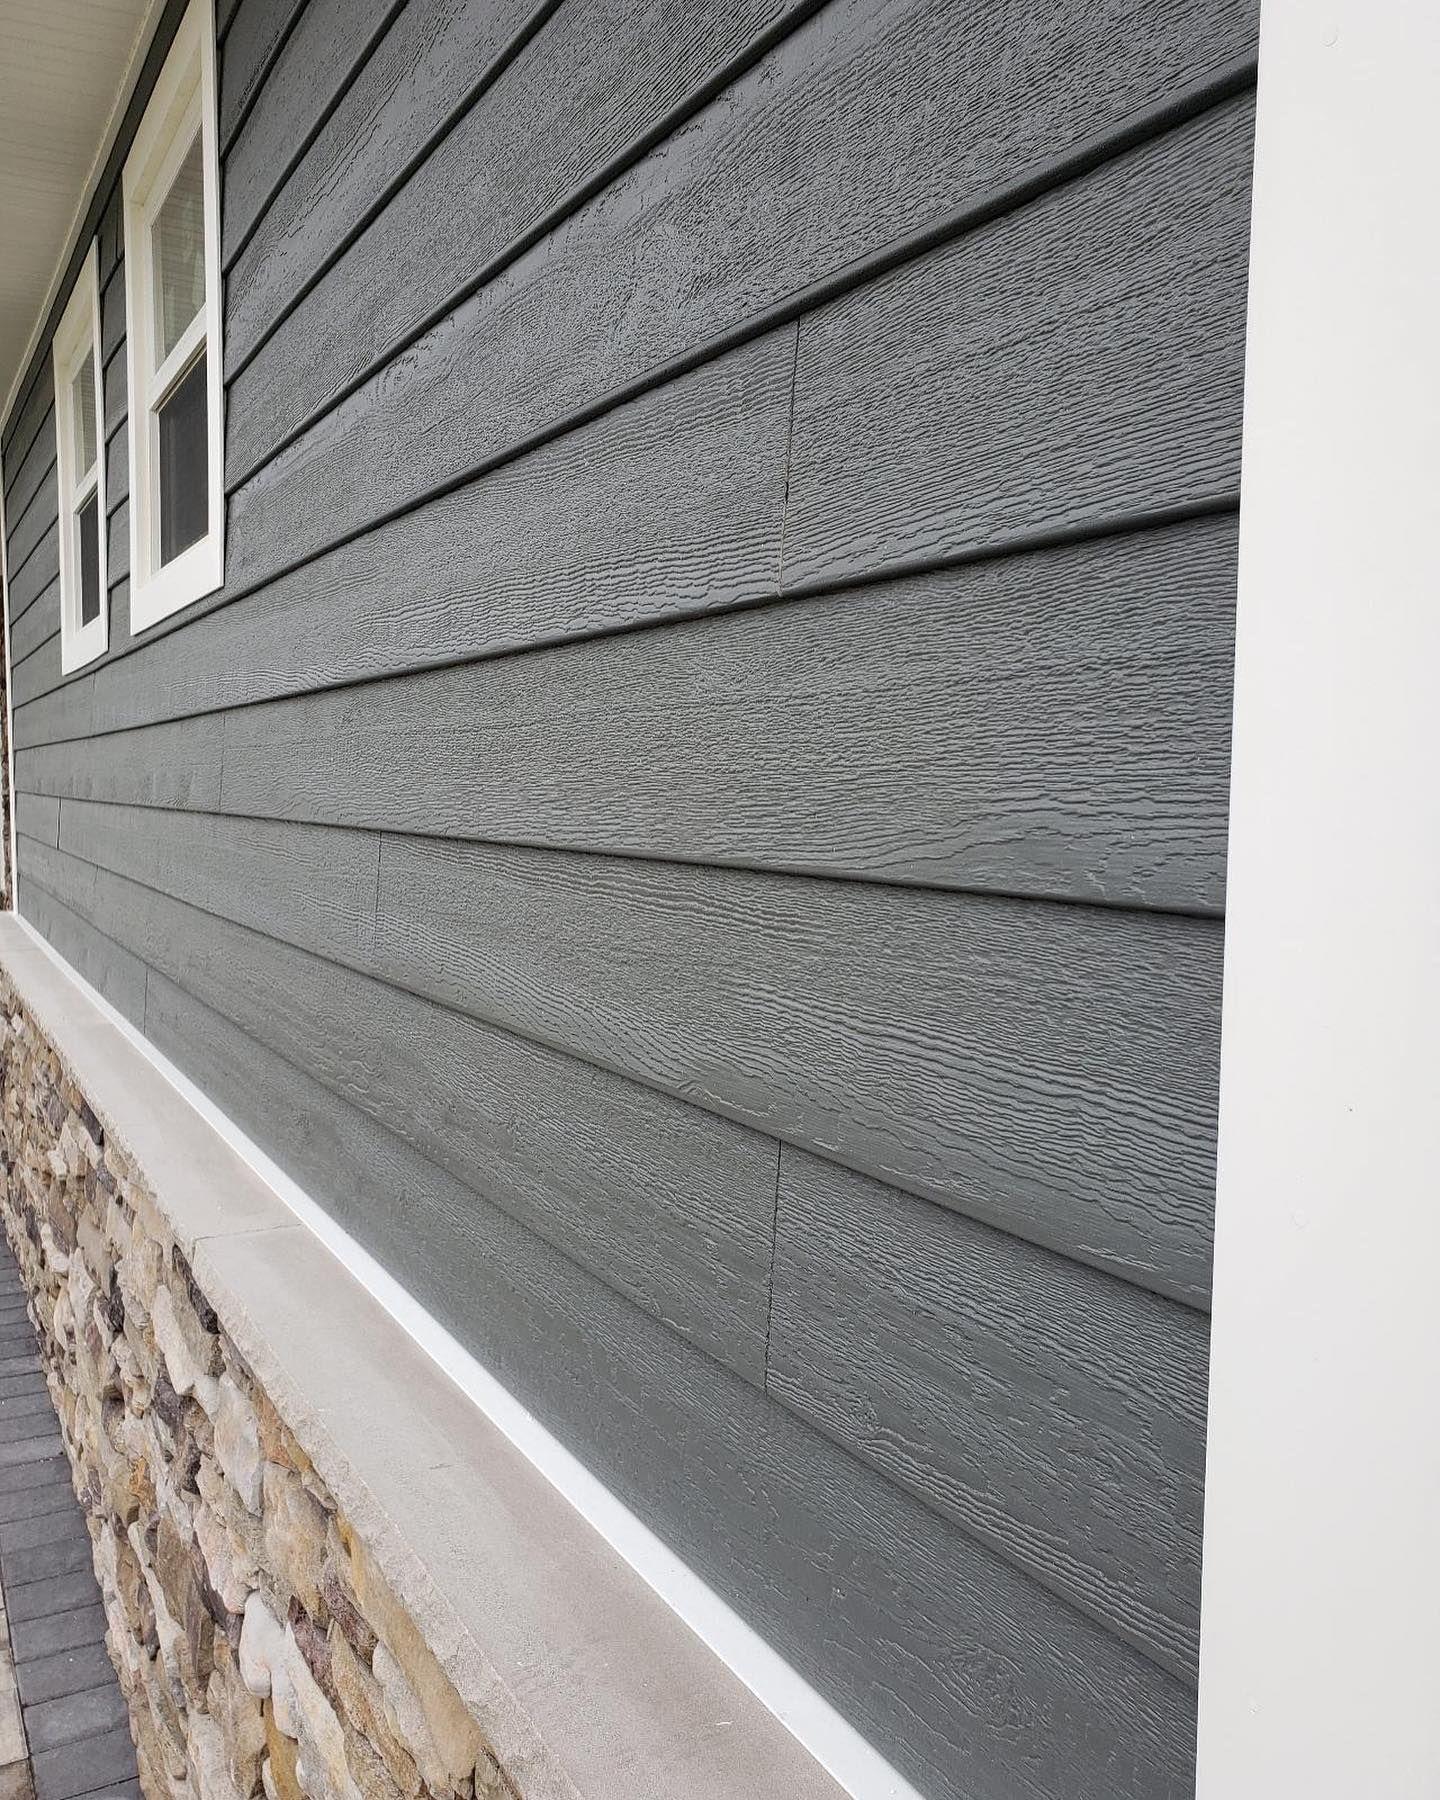 Eco Side Siding Options Wood Grain Siding Products Exterior House Siding Engineered Wood Siding Vertical Siding Exterior